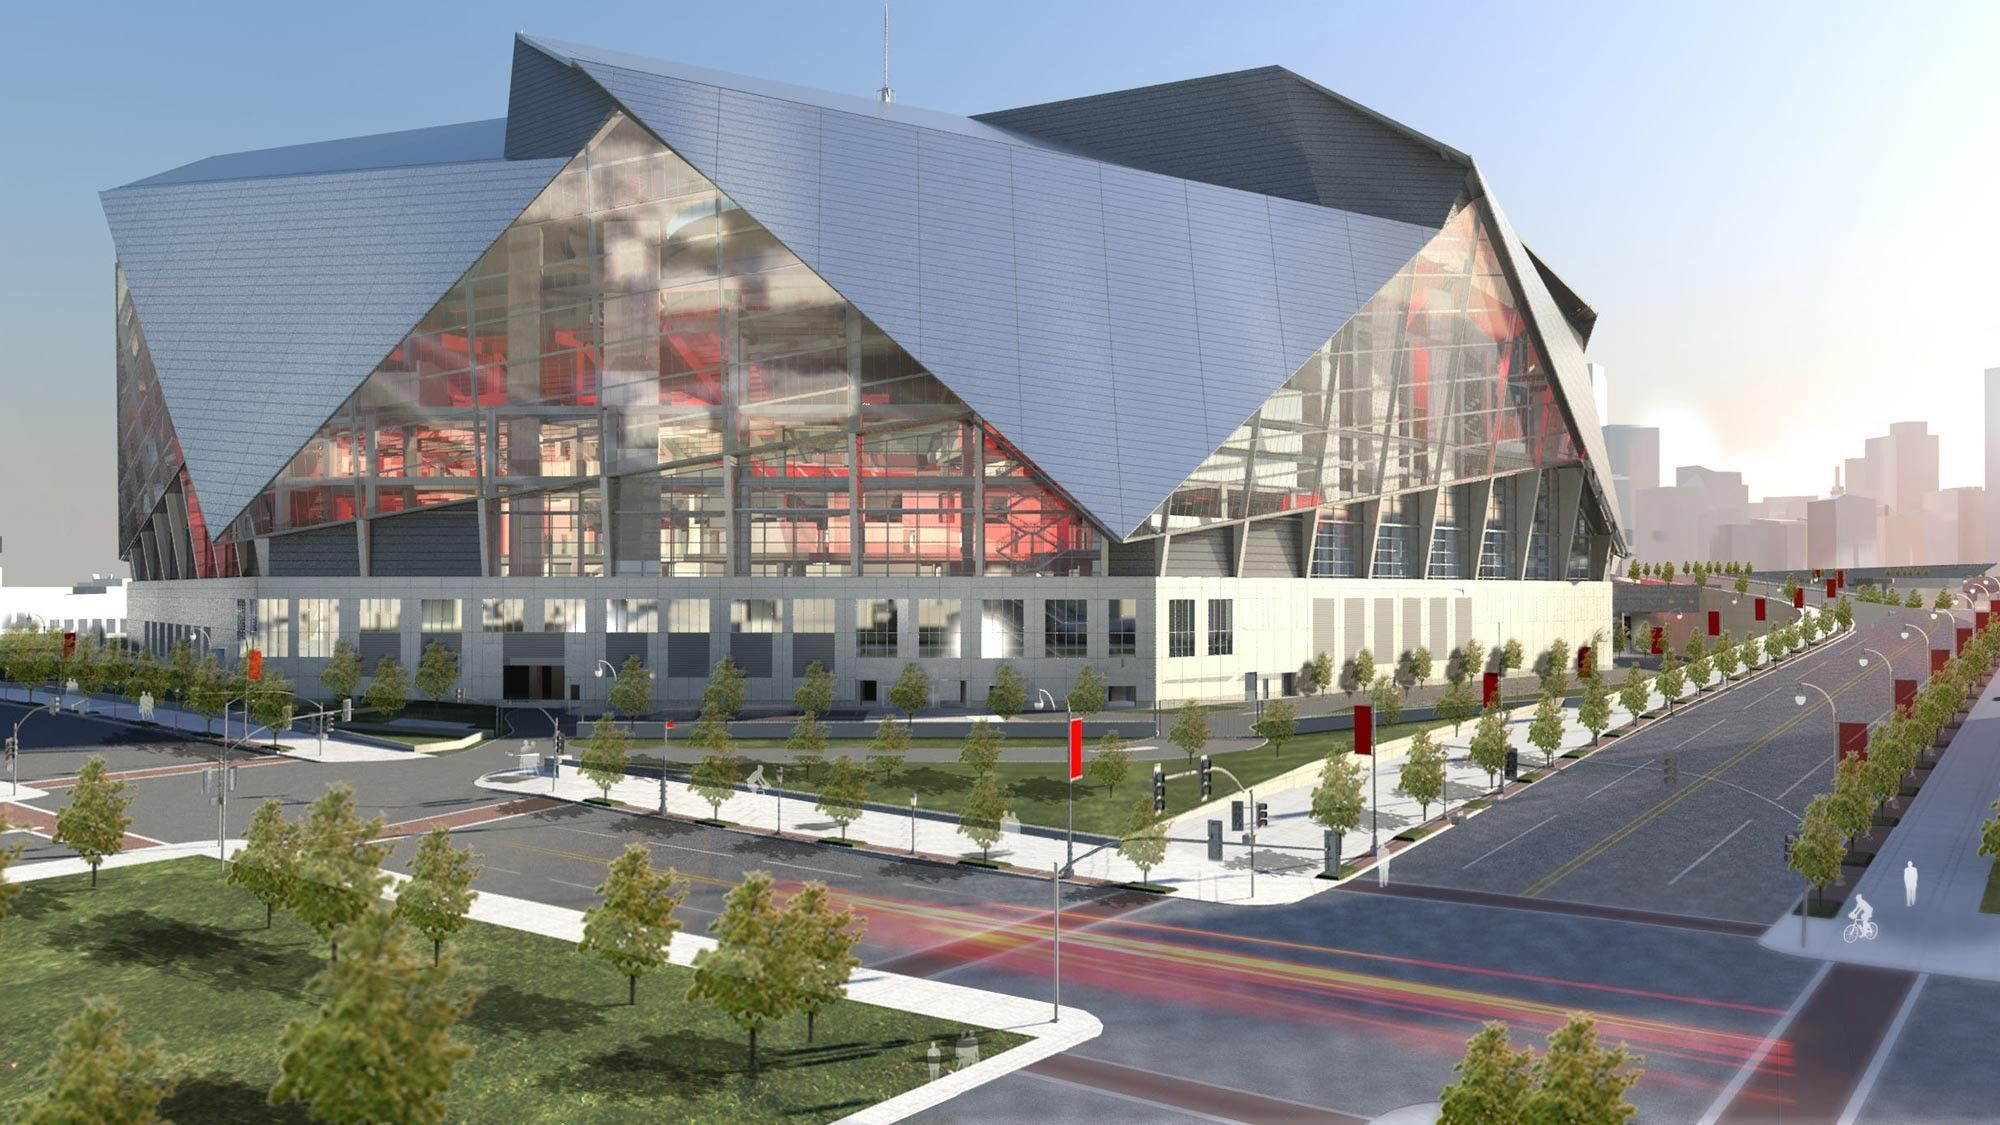 Gallery Of 360 Architecture Tops New Atlanta Stadium With Retractable Roof Petals 1 New Atlanta Stadium Architecture